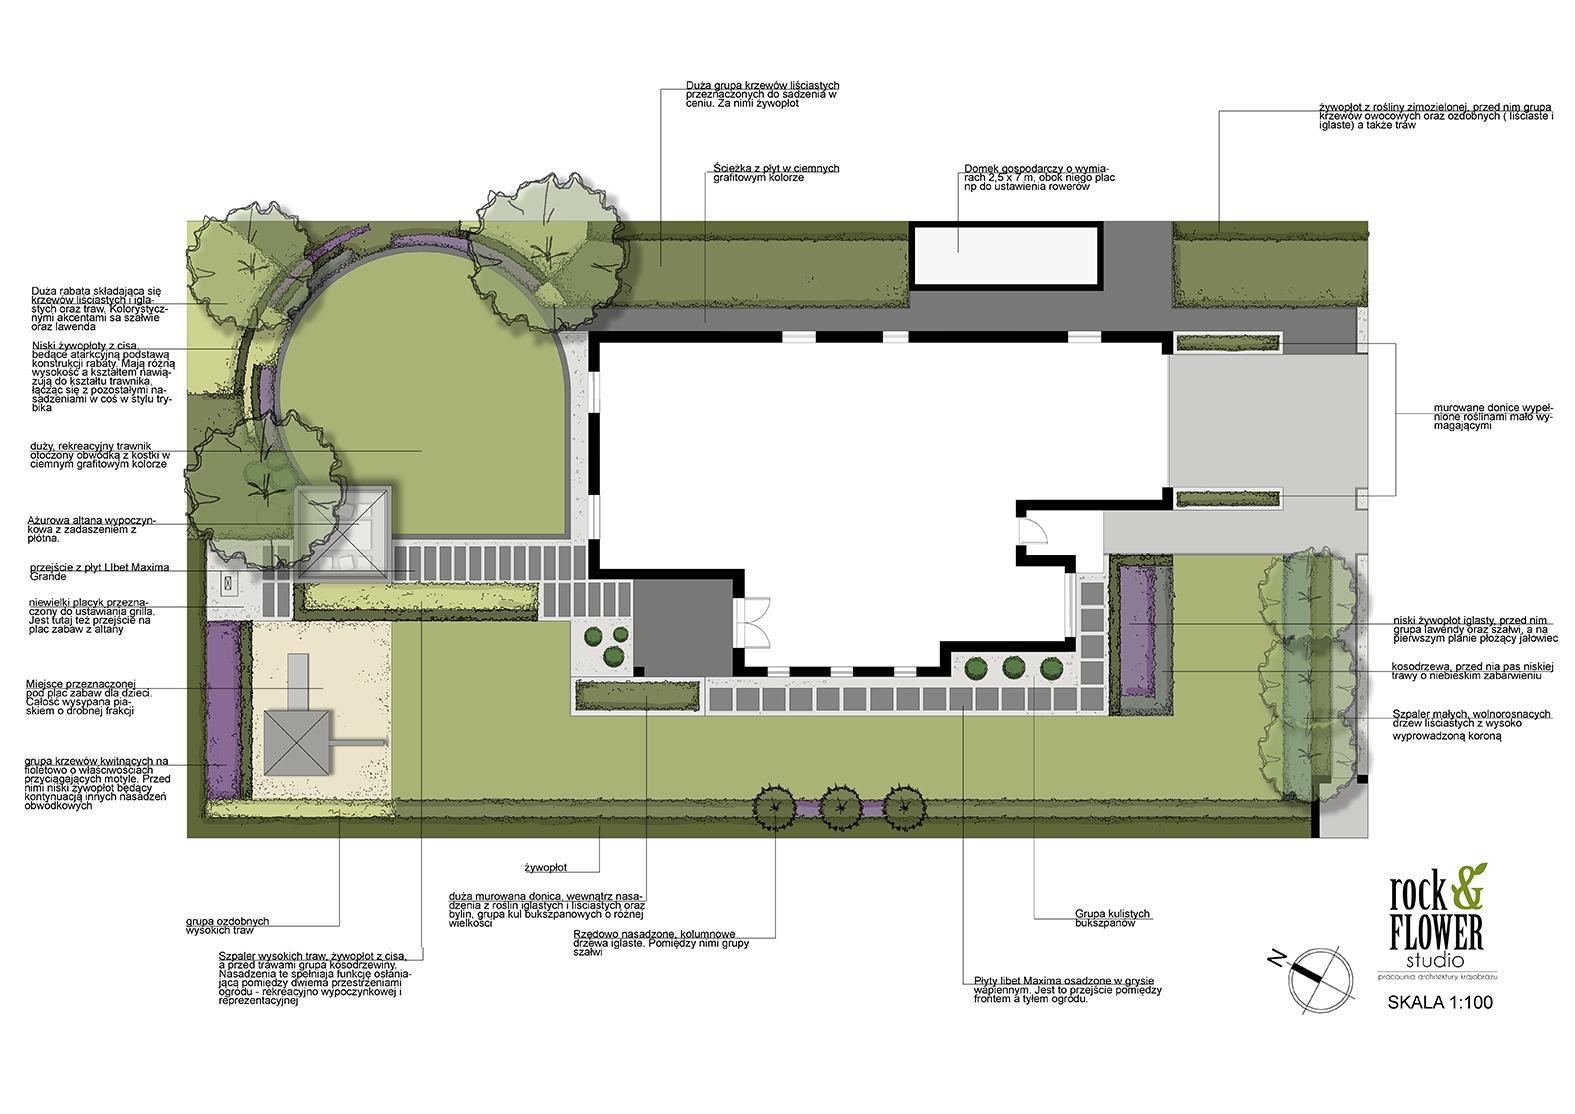 zahrada-praha-navhr-projekt-zahrady-praha-rockandflower studio